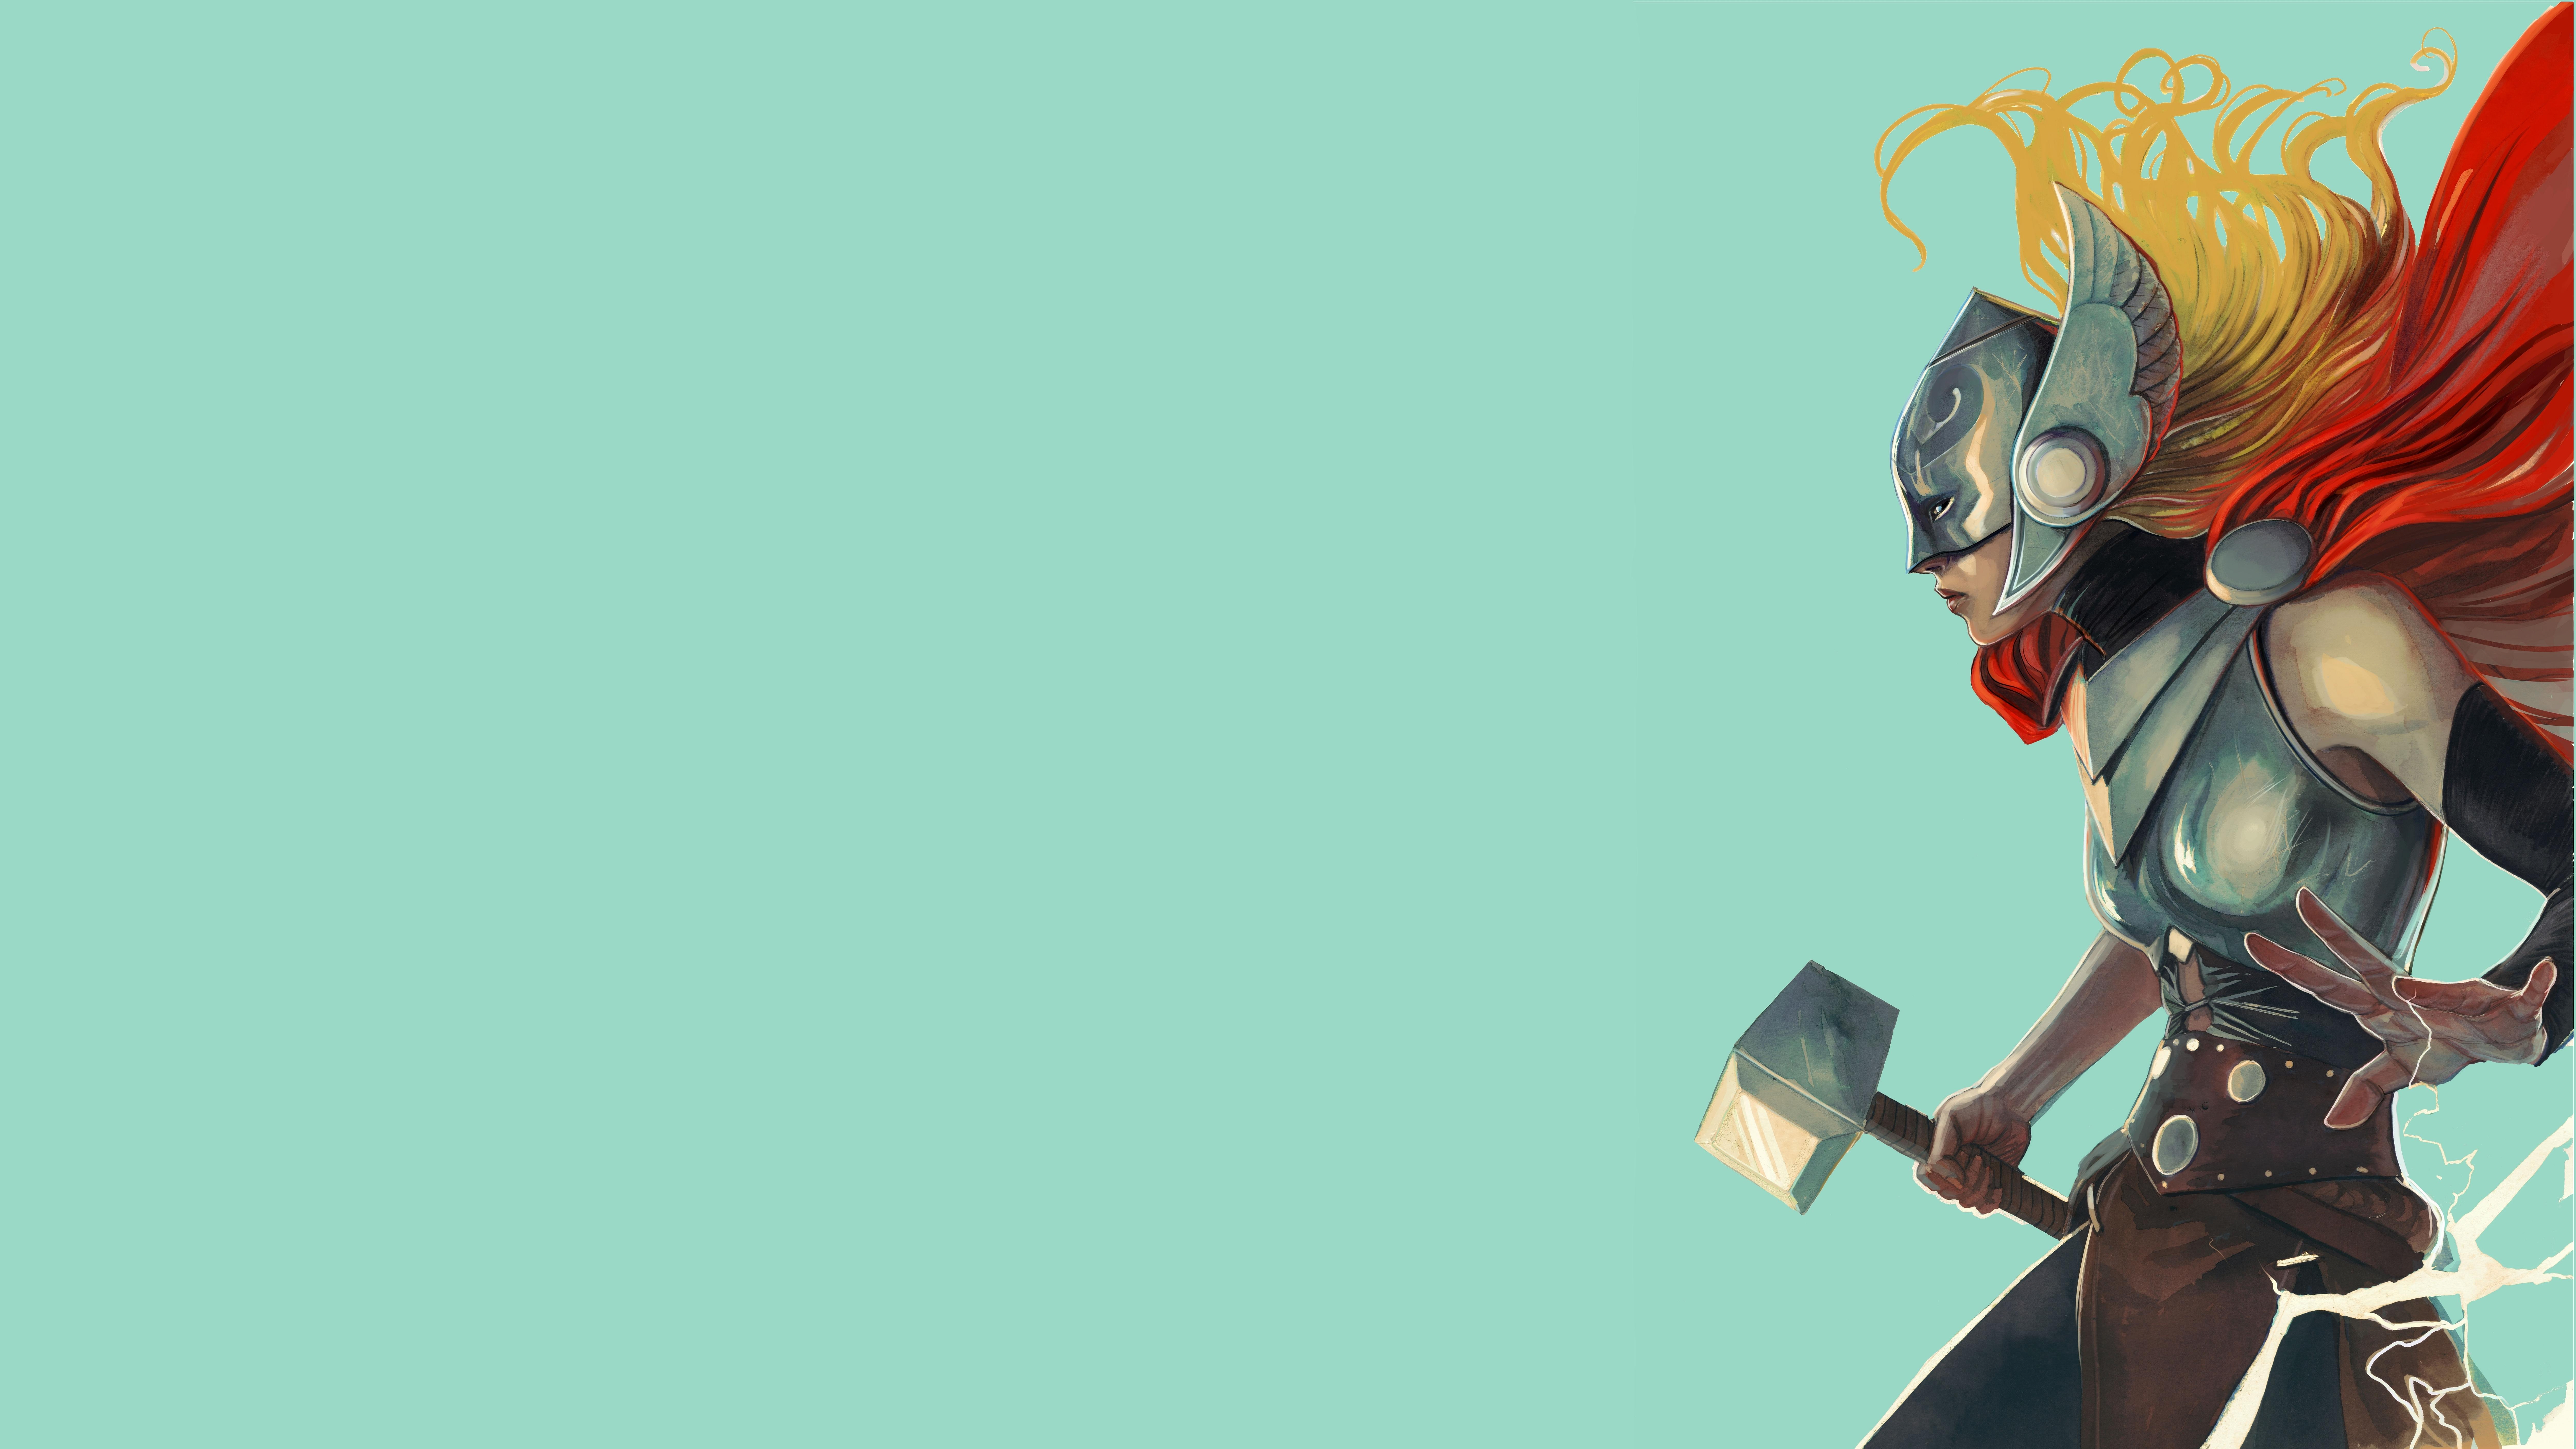 Lady thor 8k ultra hd wallpaper background image - Thor art wallpaper ...